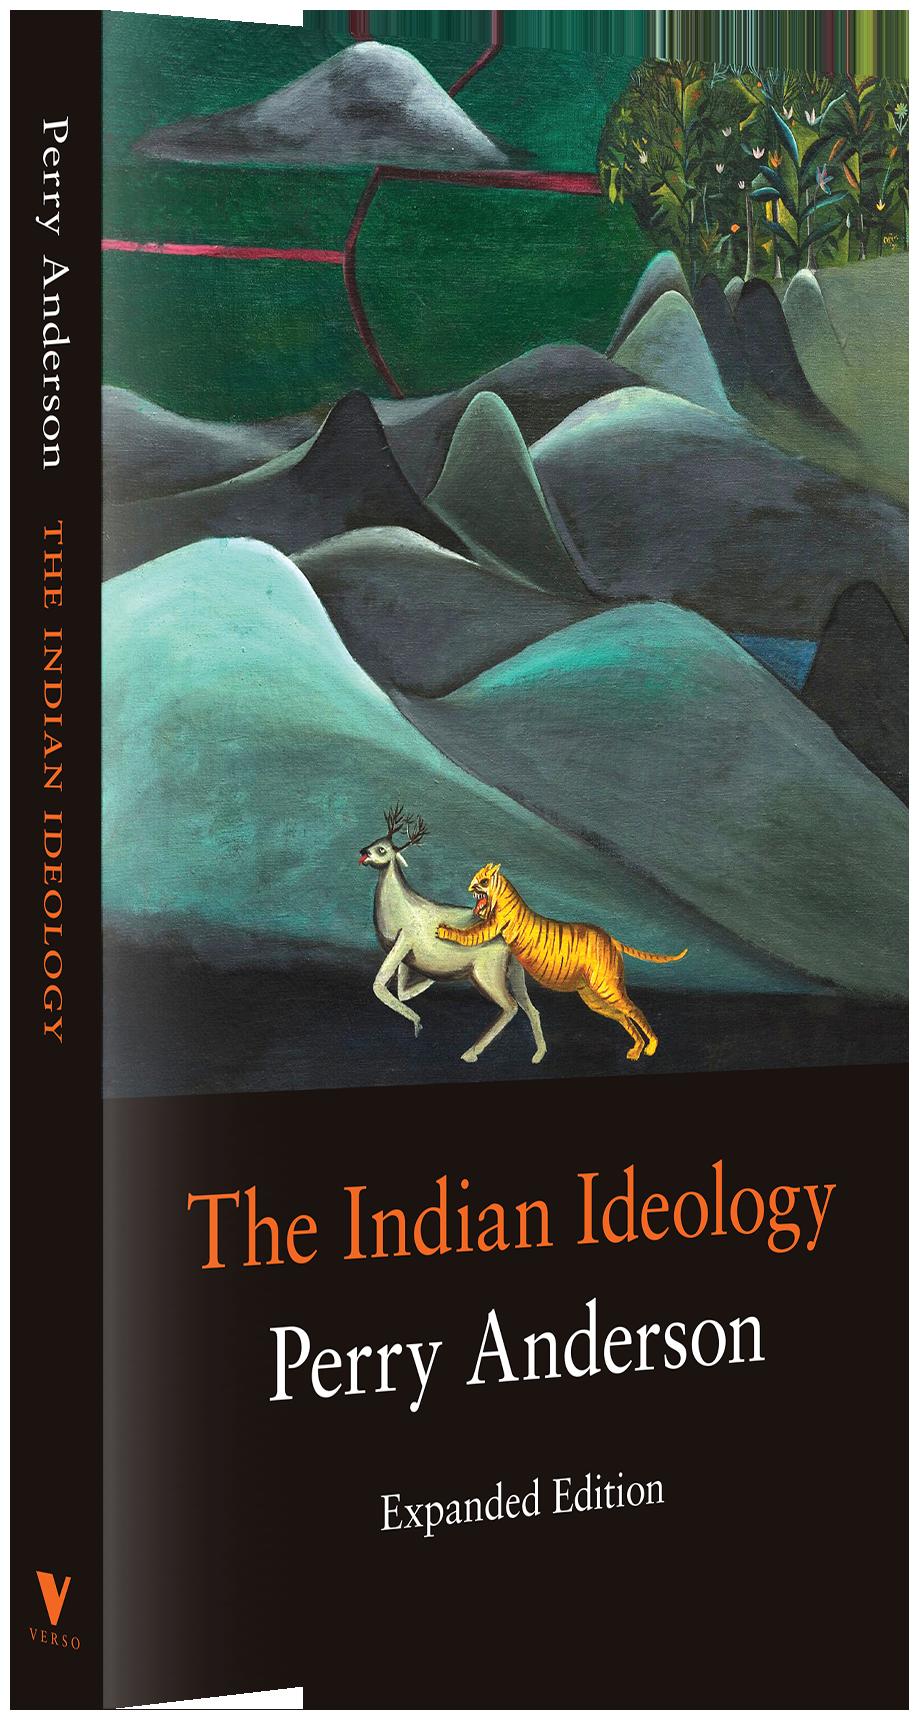 Indian-ideology